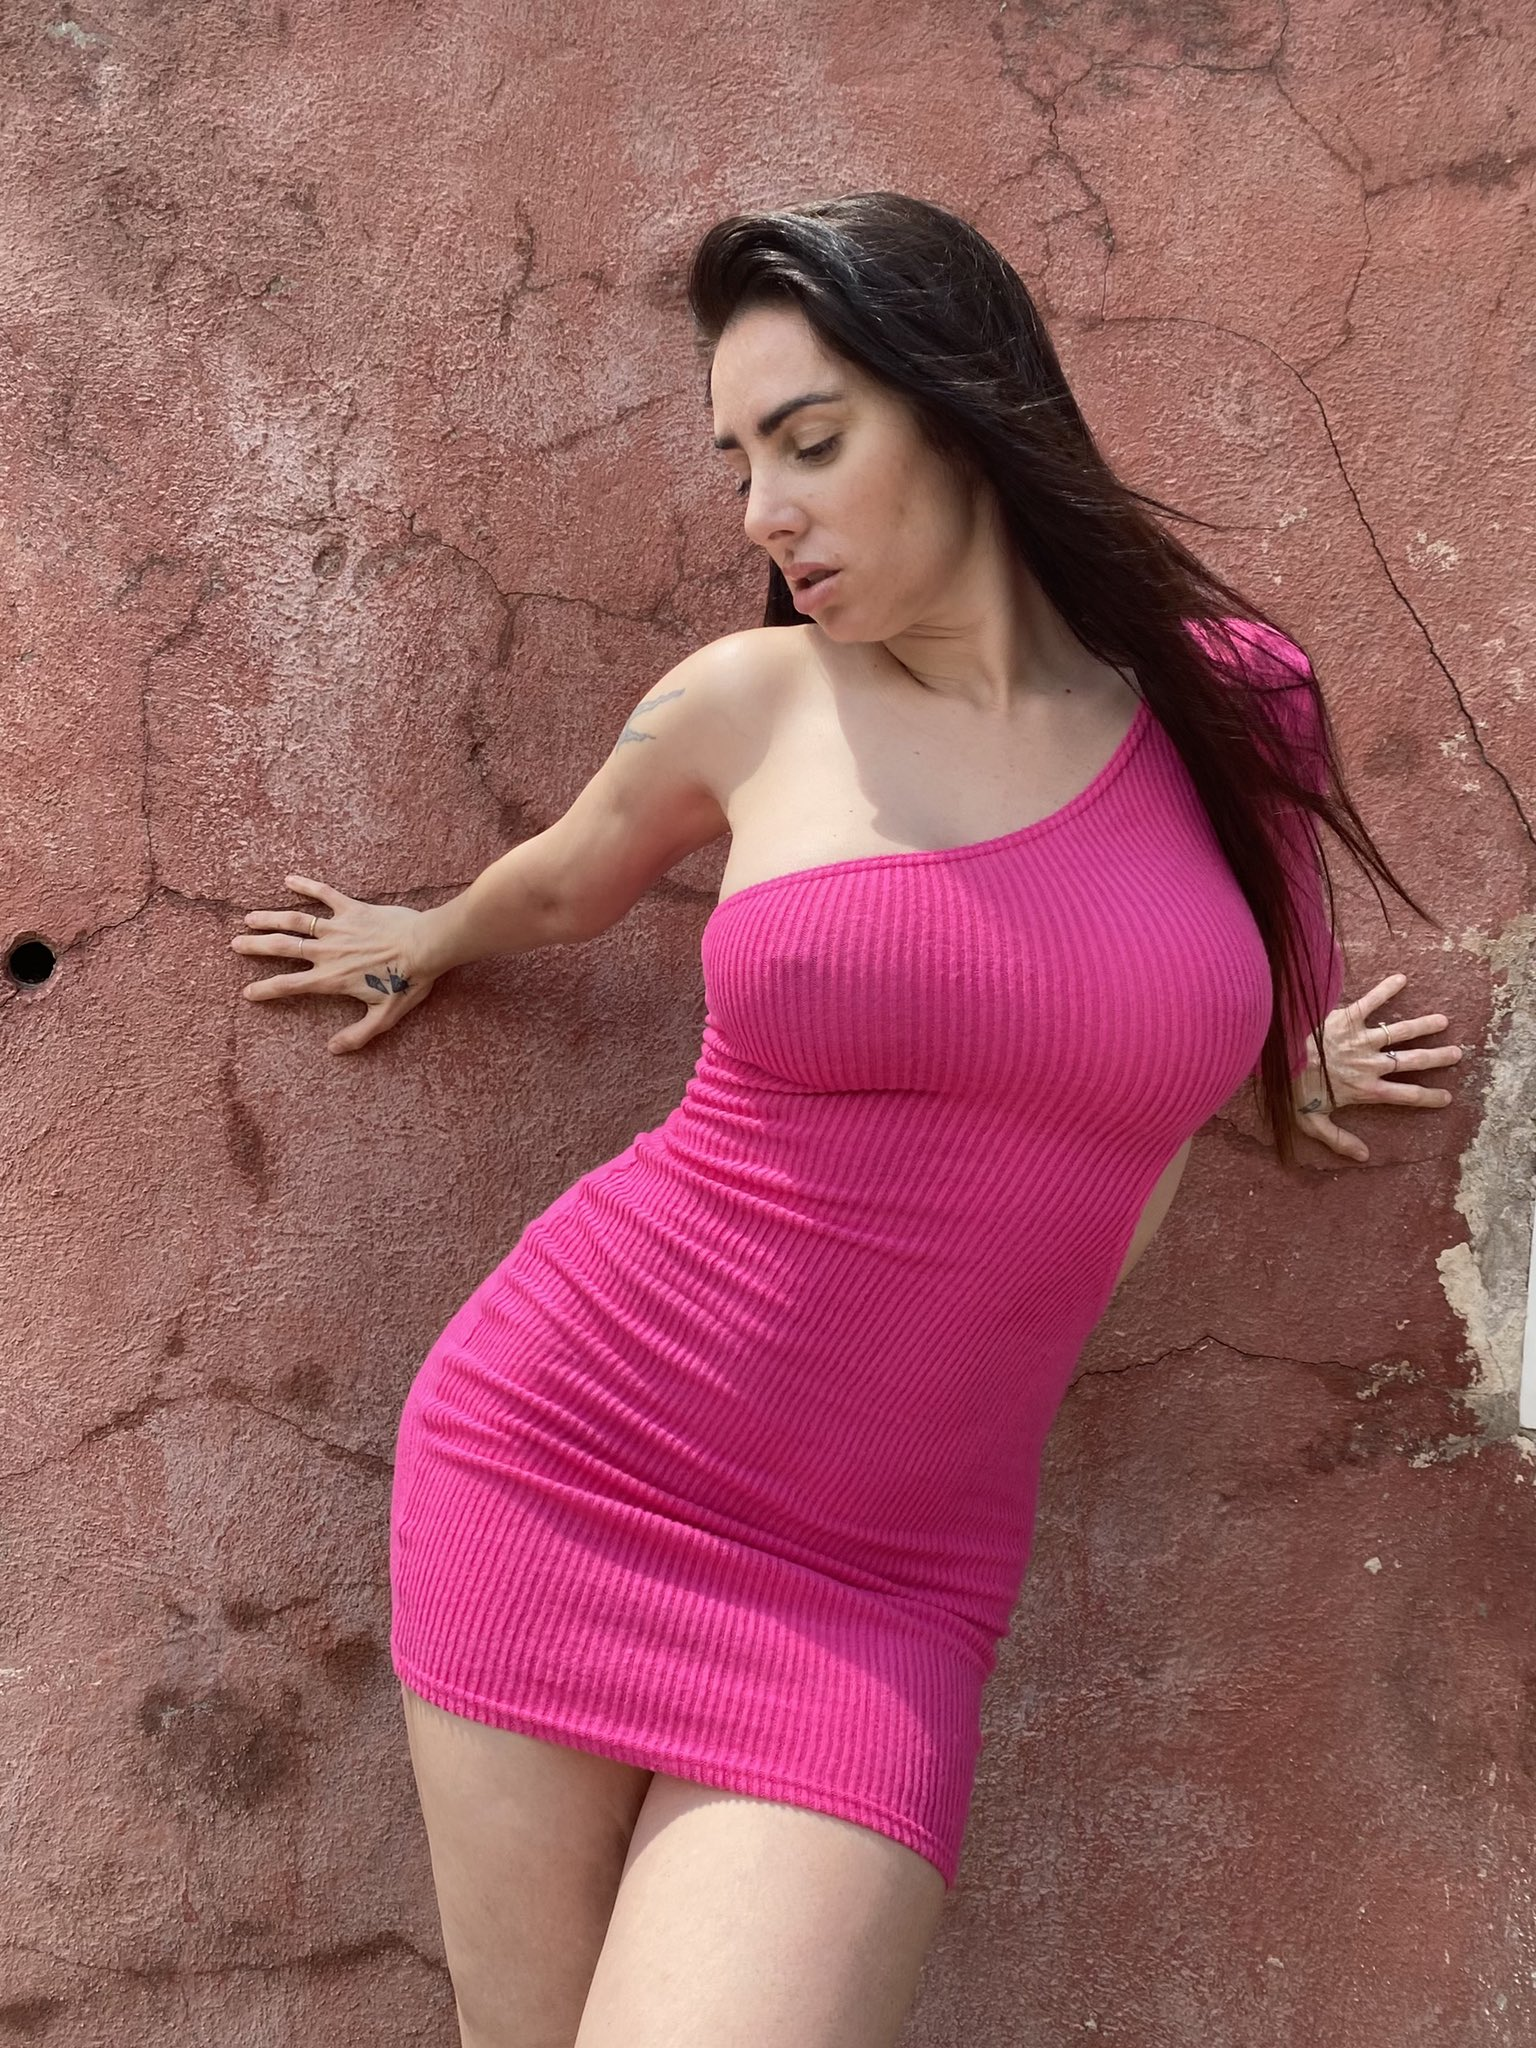 La Mala Rodríguez - Página 11 E11MMGEXIAQlBt2?format=jpg&name=large